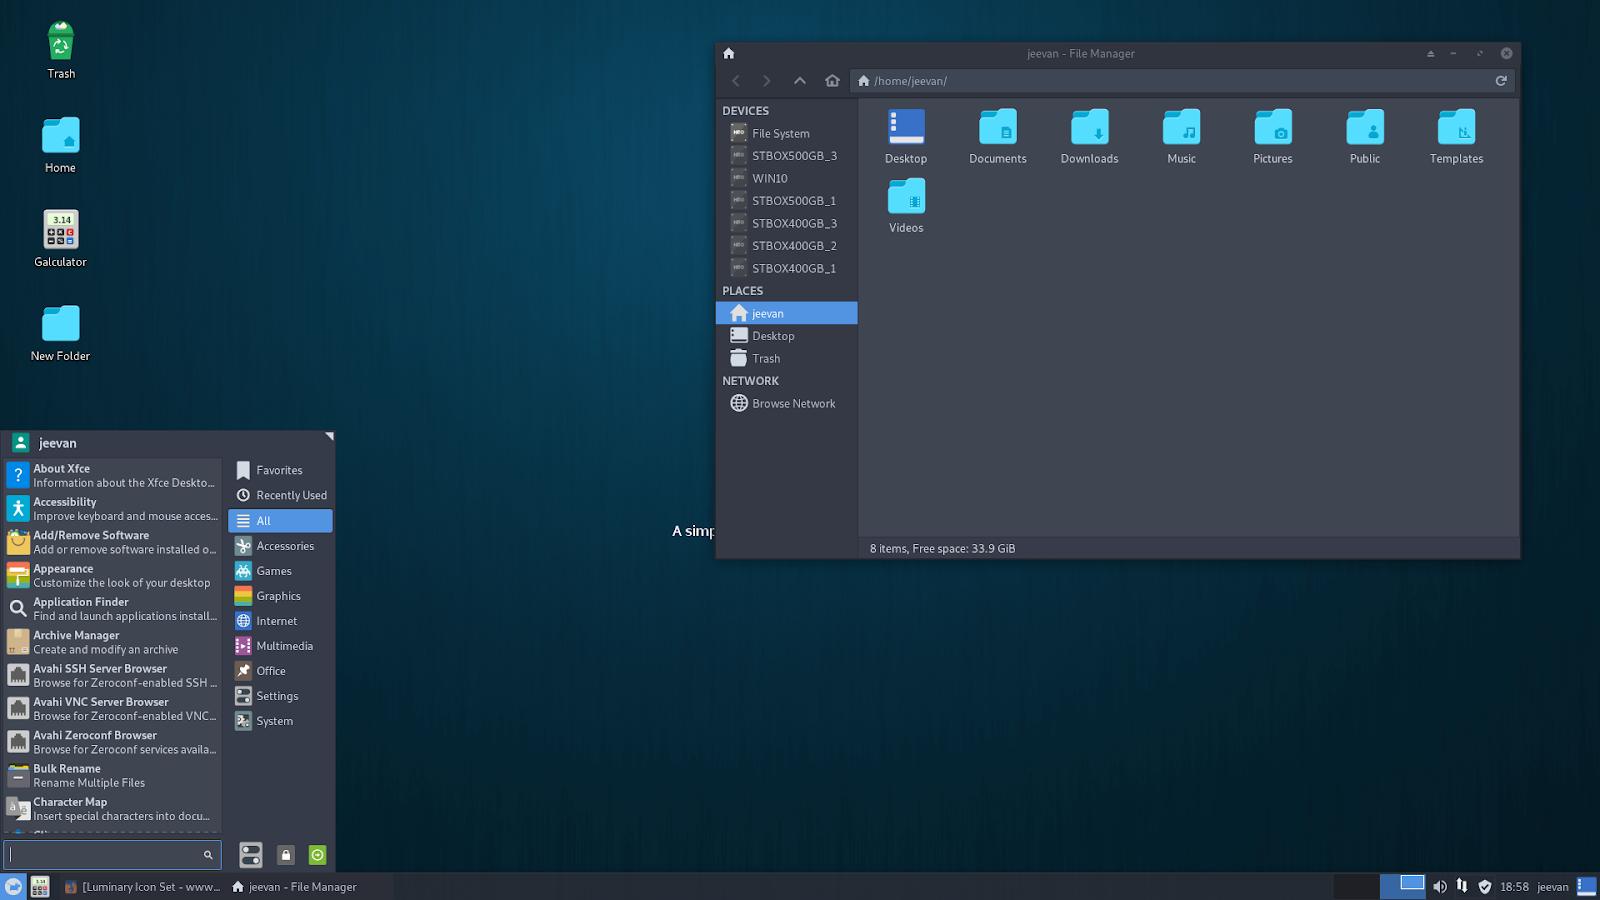 Luminary Icons Themes For Ubuntu (18 04 Bionic and 18 10 Cosmic